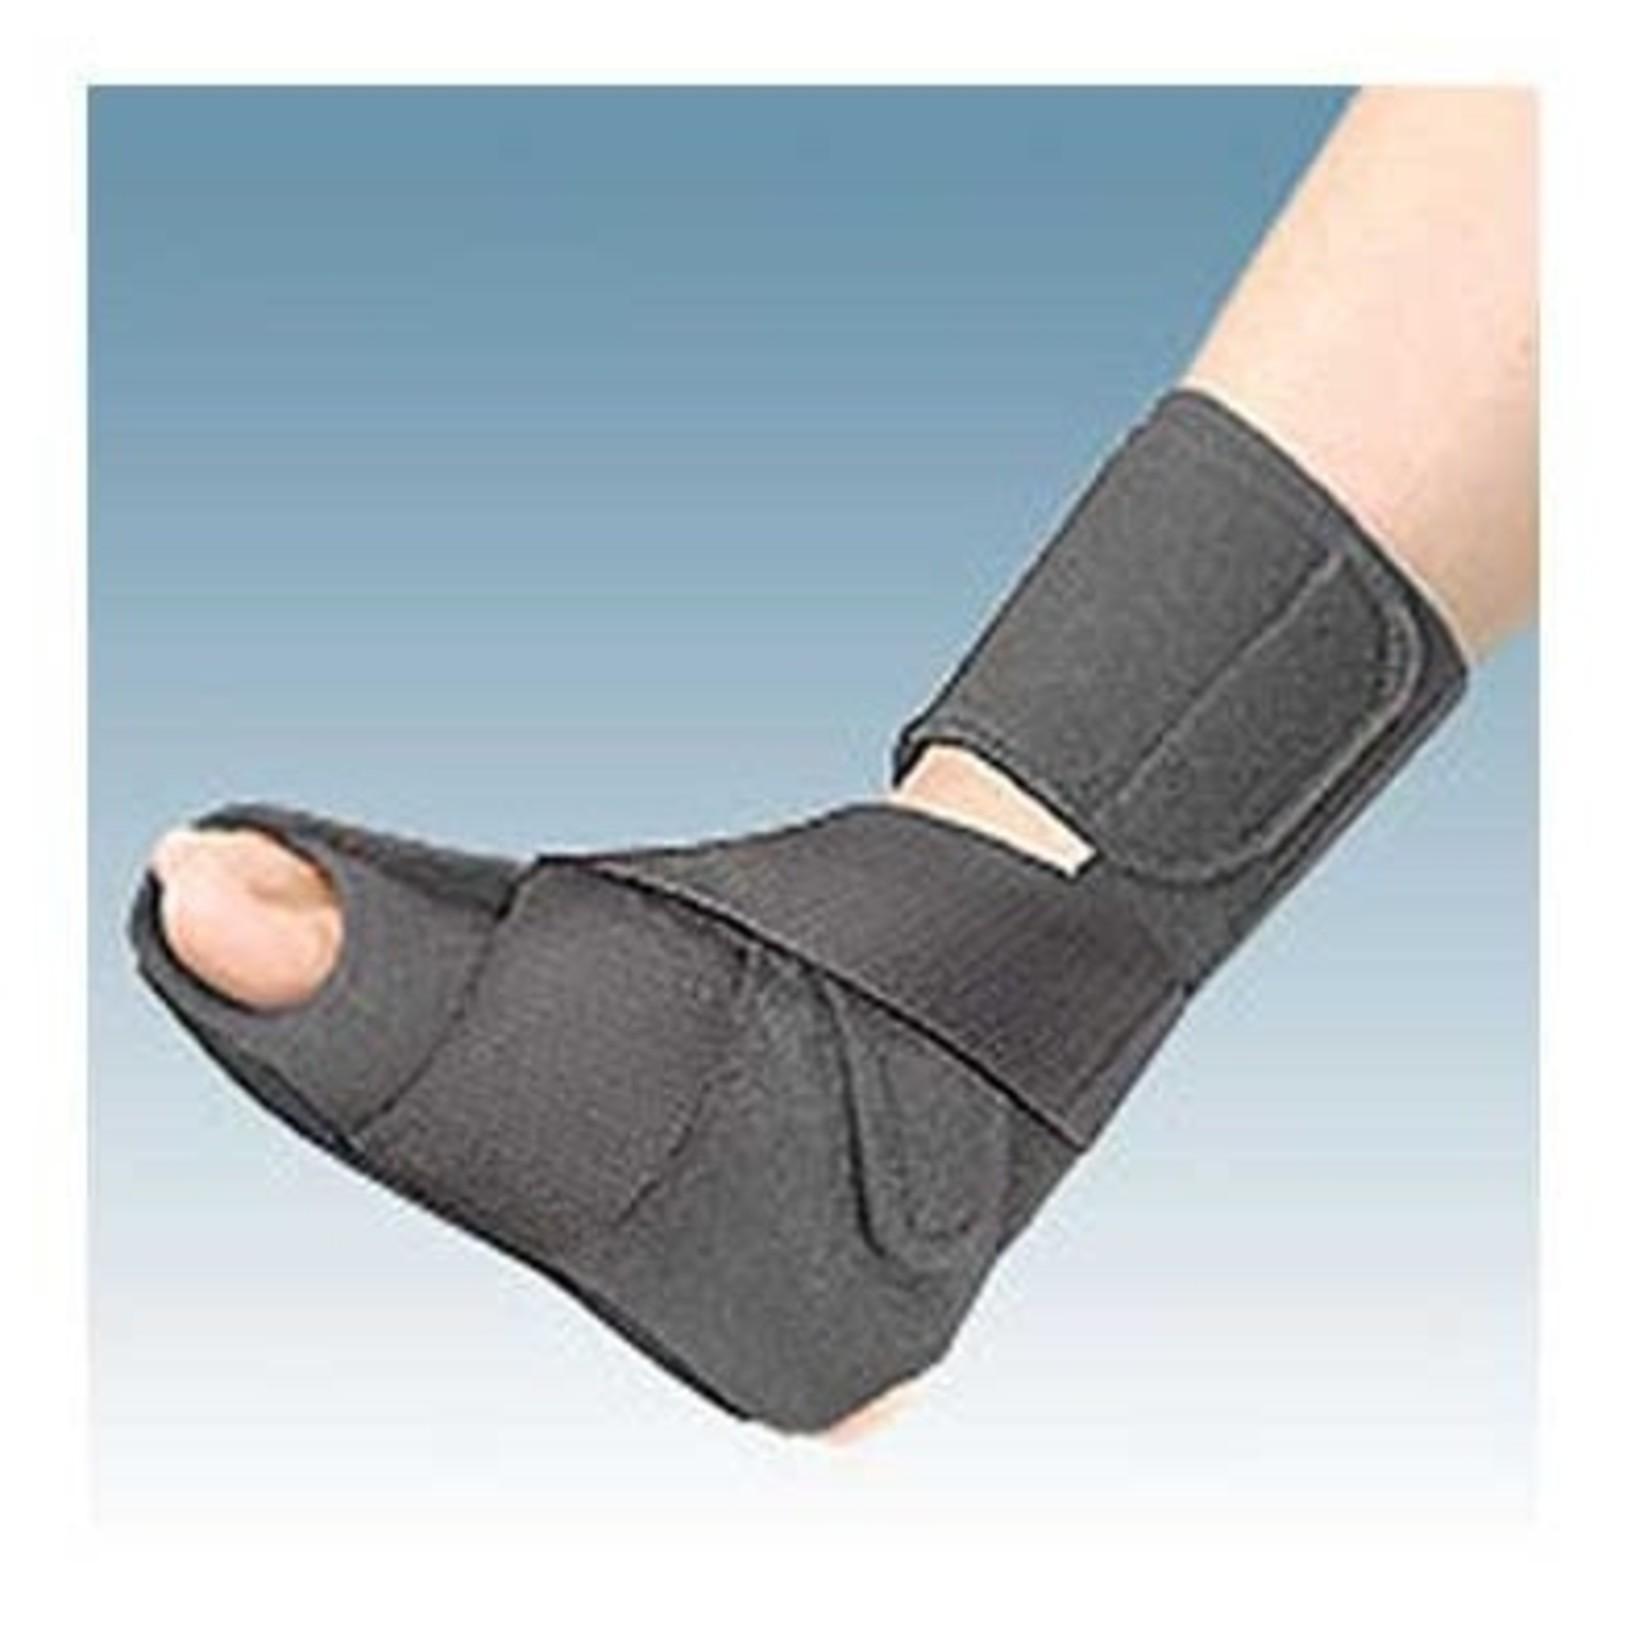 FLA Orthopedics HEALWELL AFO NIGHT WRAP BLACK SM/MD